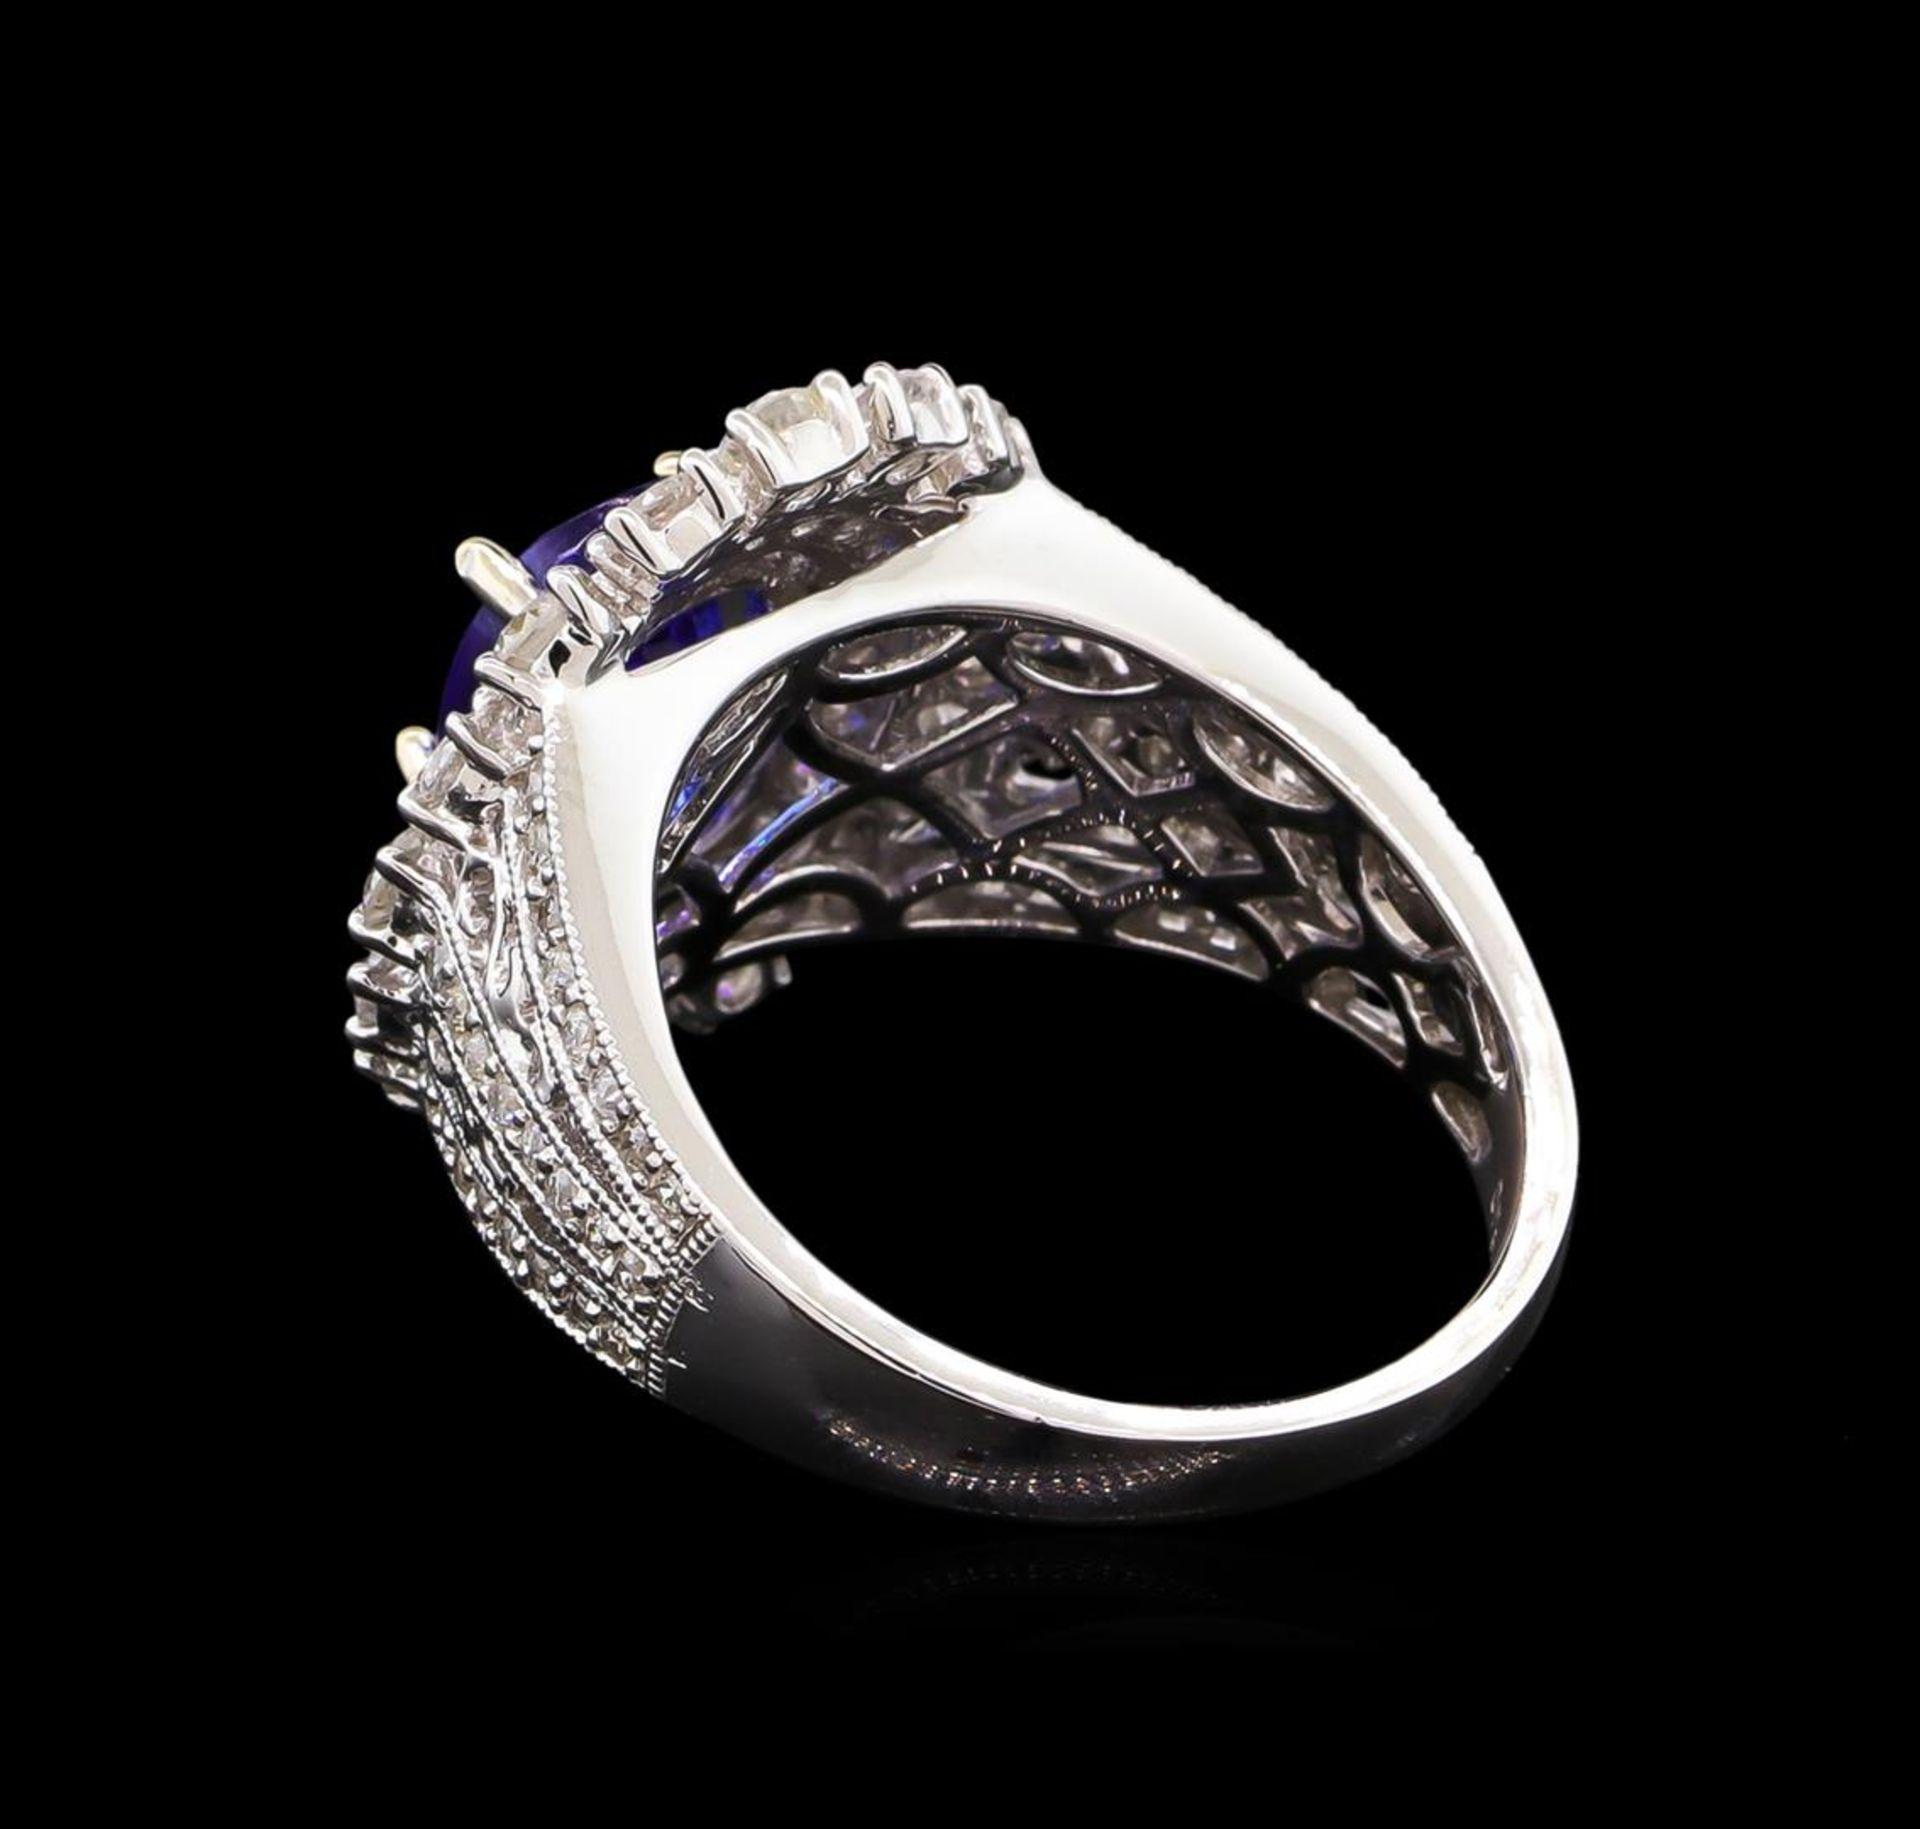 14KT White Gold 2.20 ctw Tanzanite and Diamond Ring - Image 3 of 5